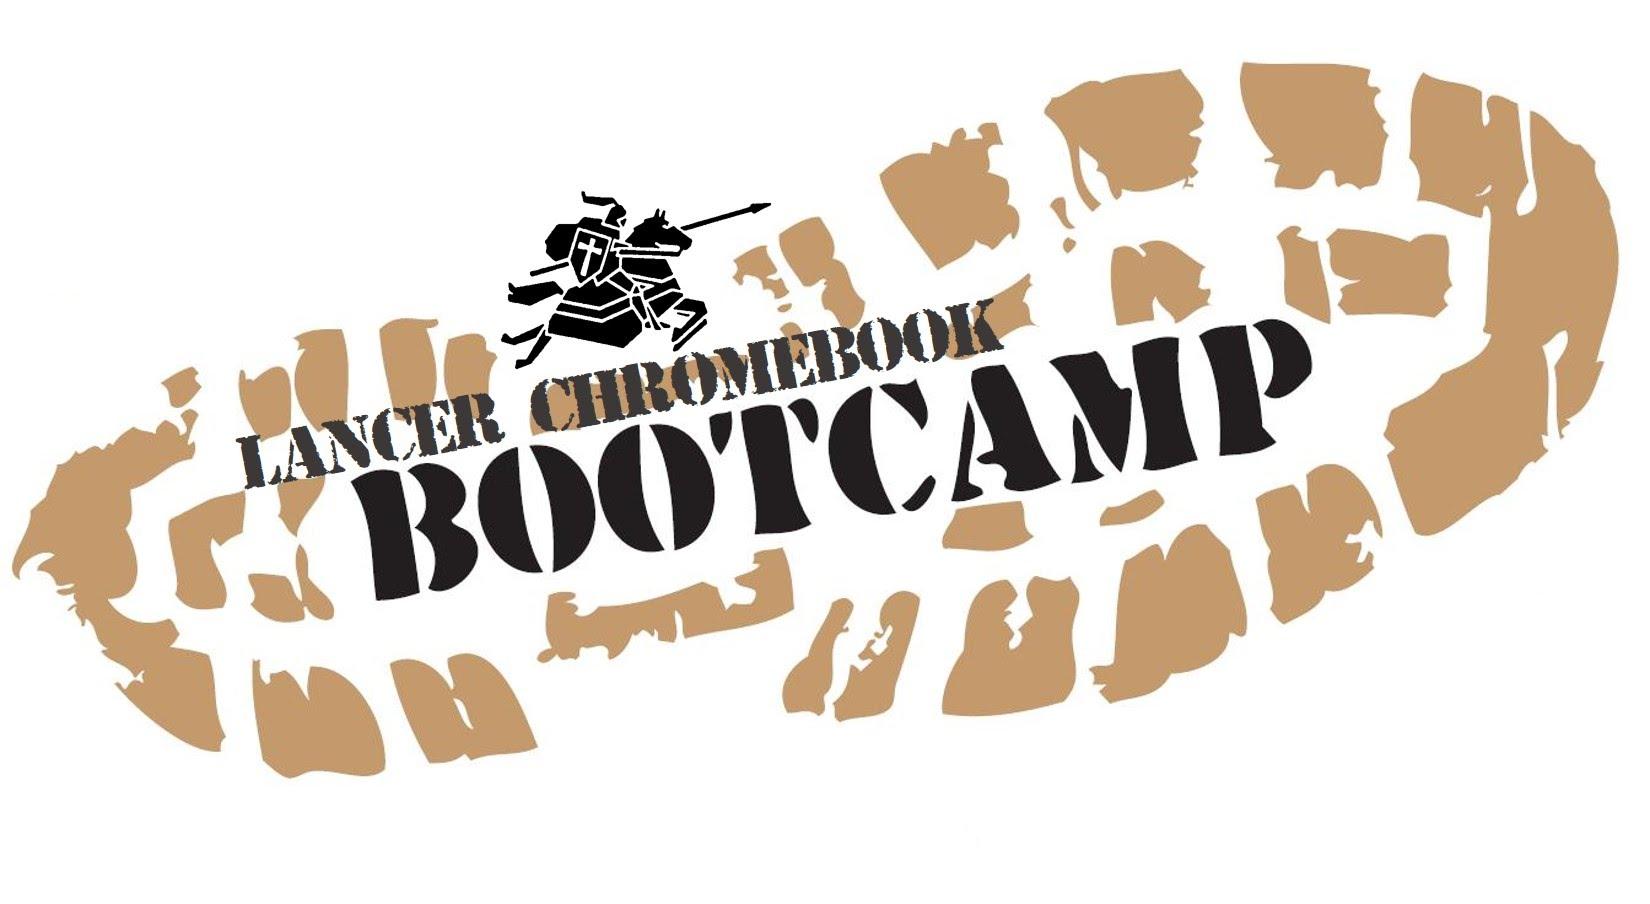 Chromebook BootCamp